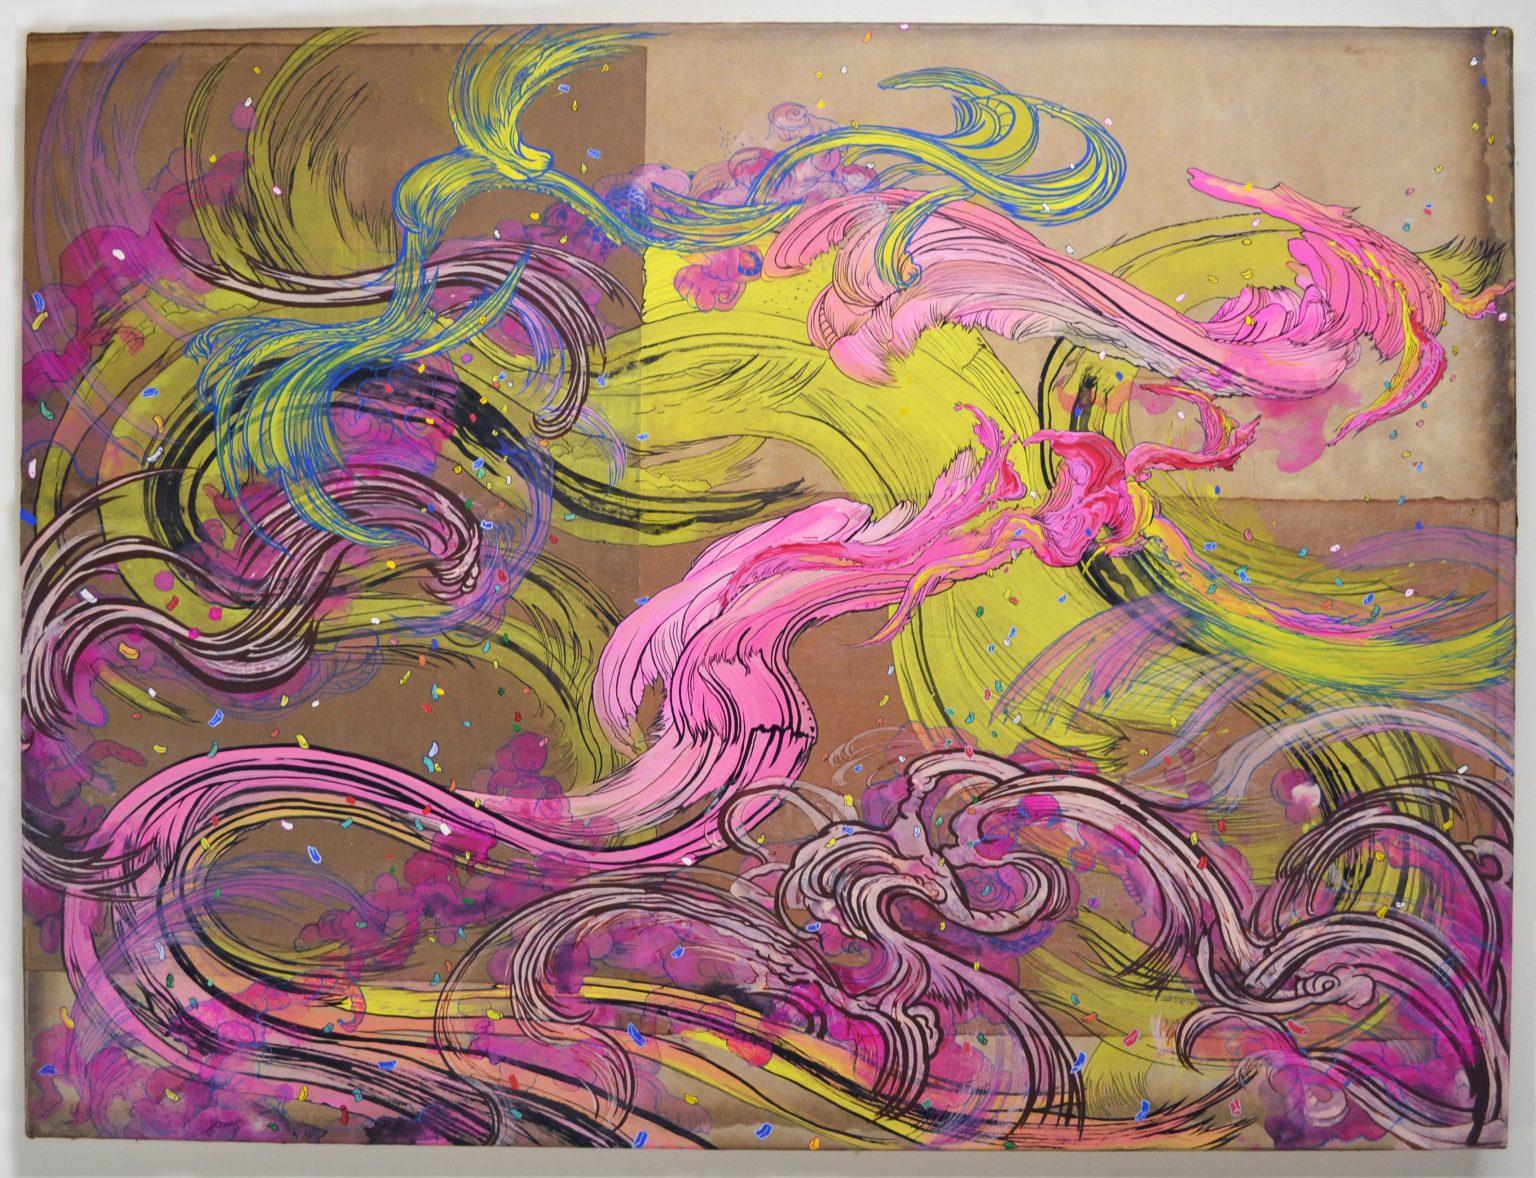 Fluid, organic swirls of bubblegum pink and yellow